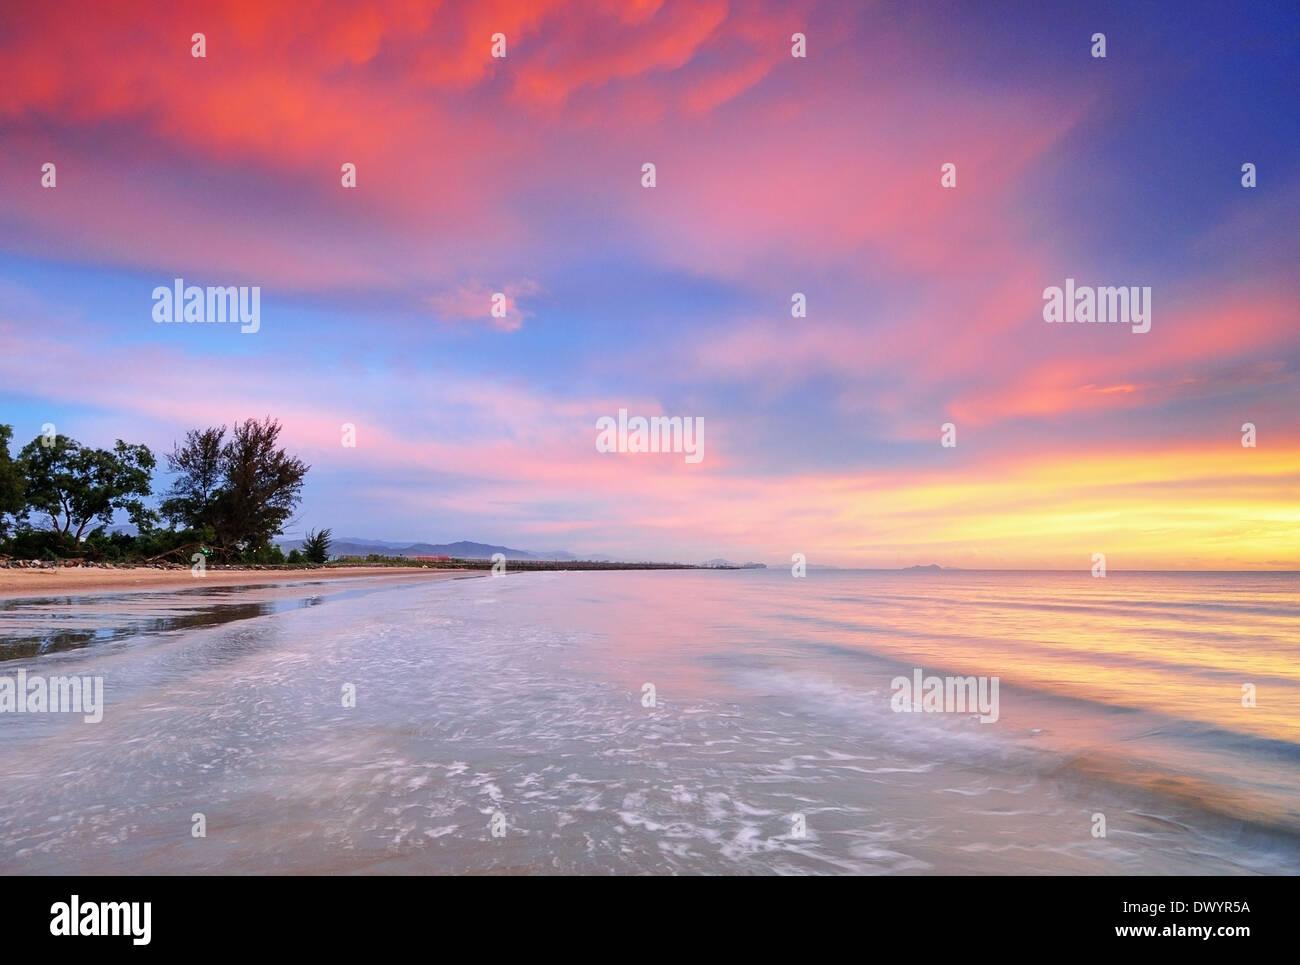 Tropical sunset and waves at the beach in Kota Kinabalu, Sabah, Borneo, Malaysia. - Stock Image